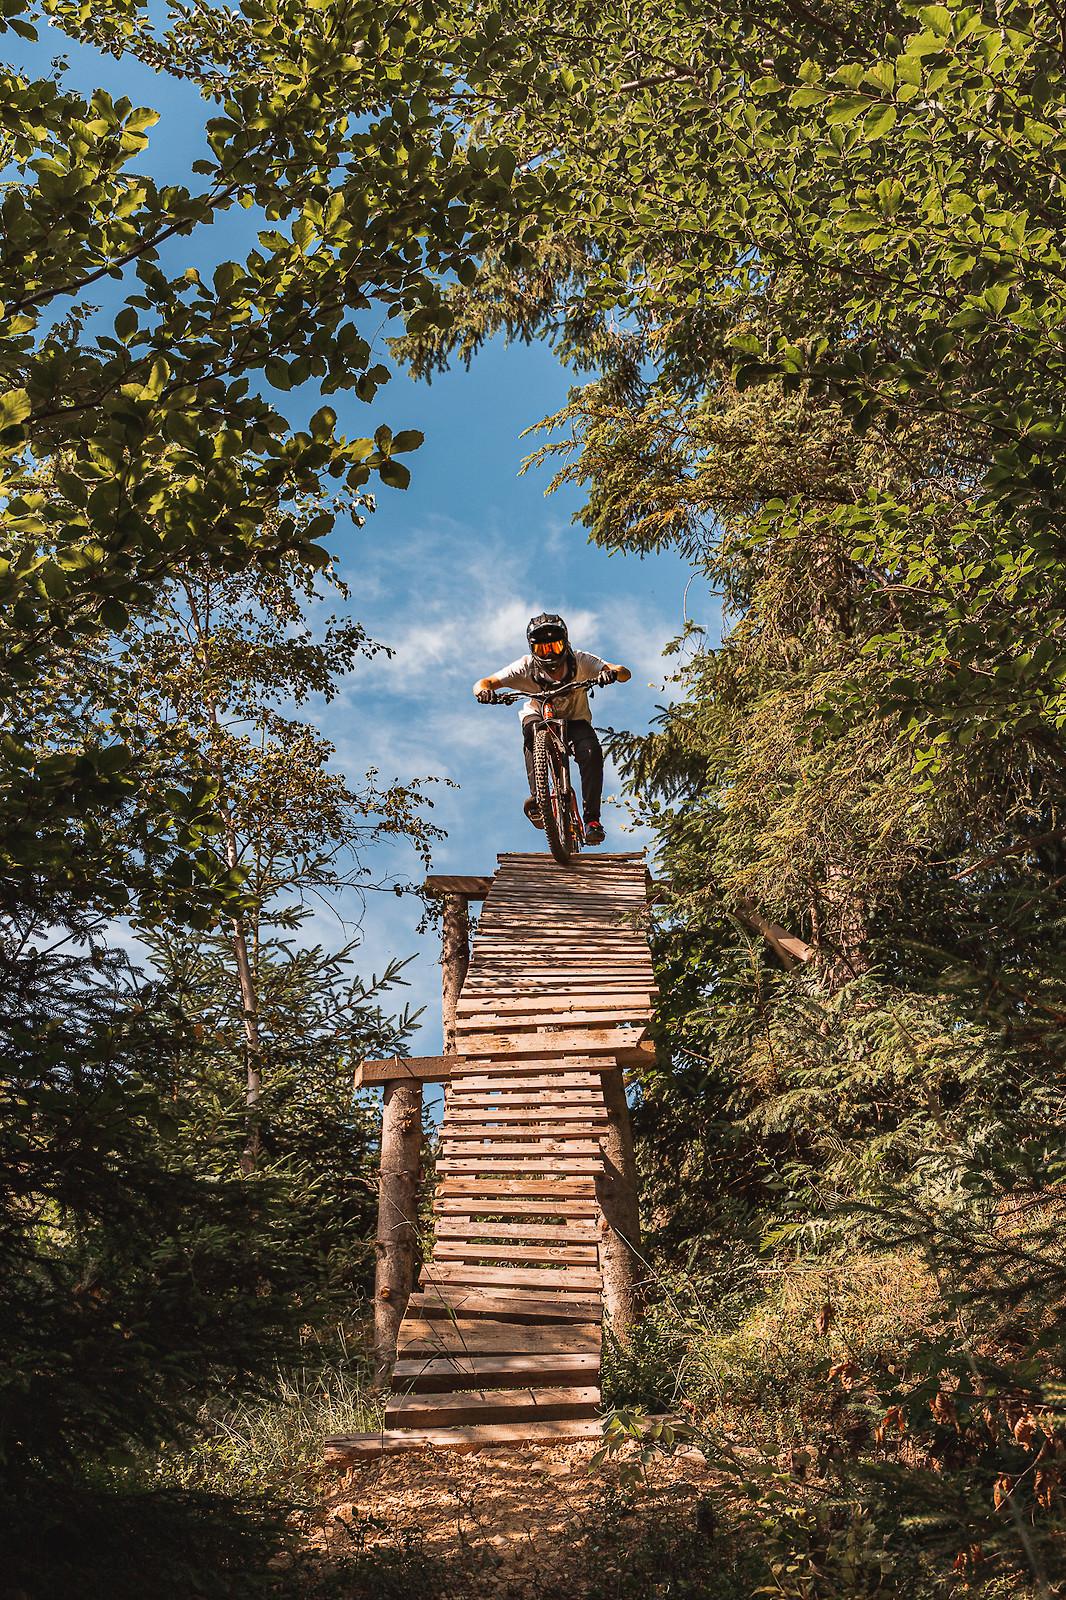 local spot - Banan - Mountain Biking Pictures - Vital MTB